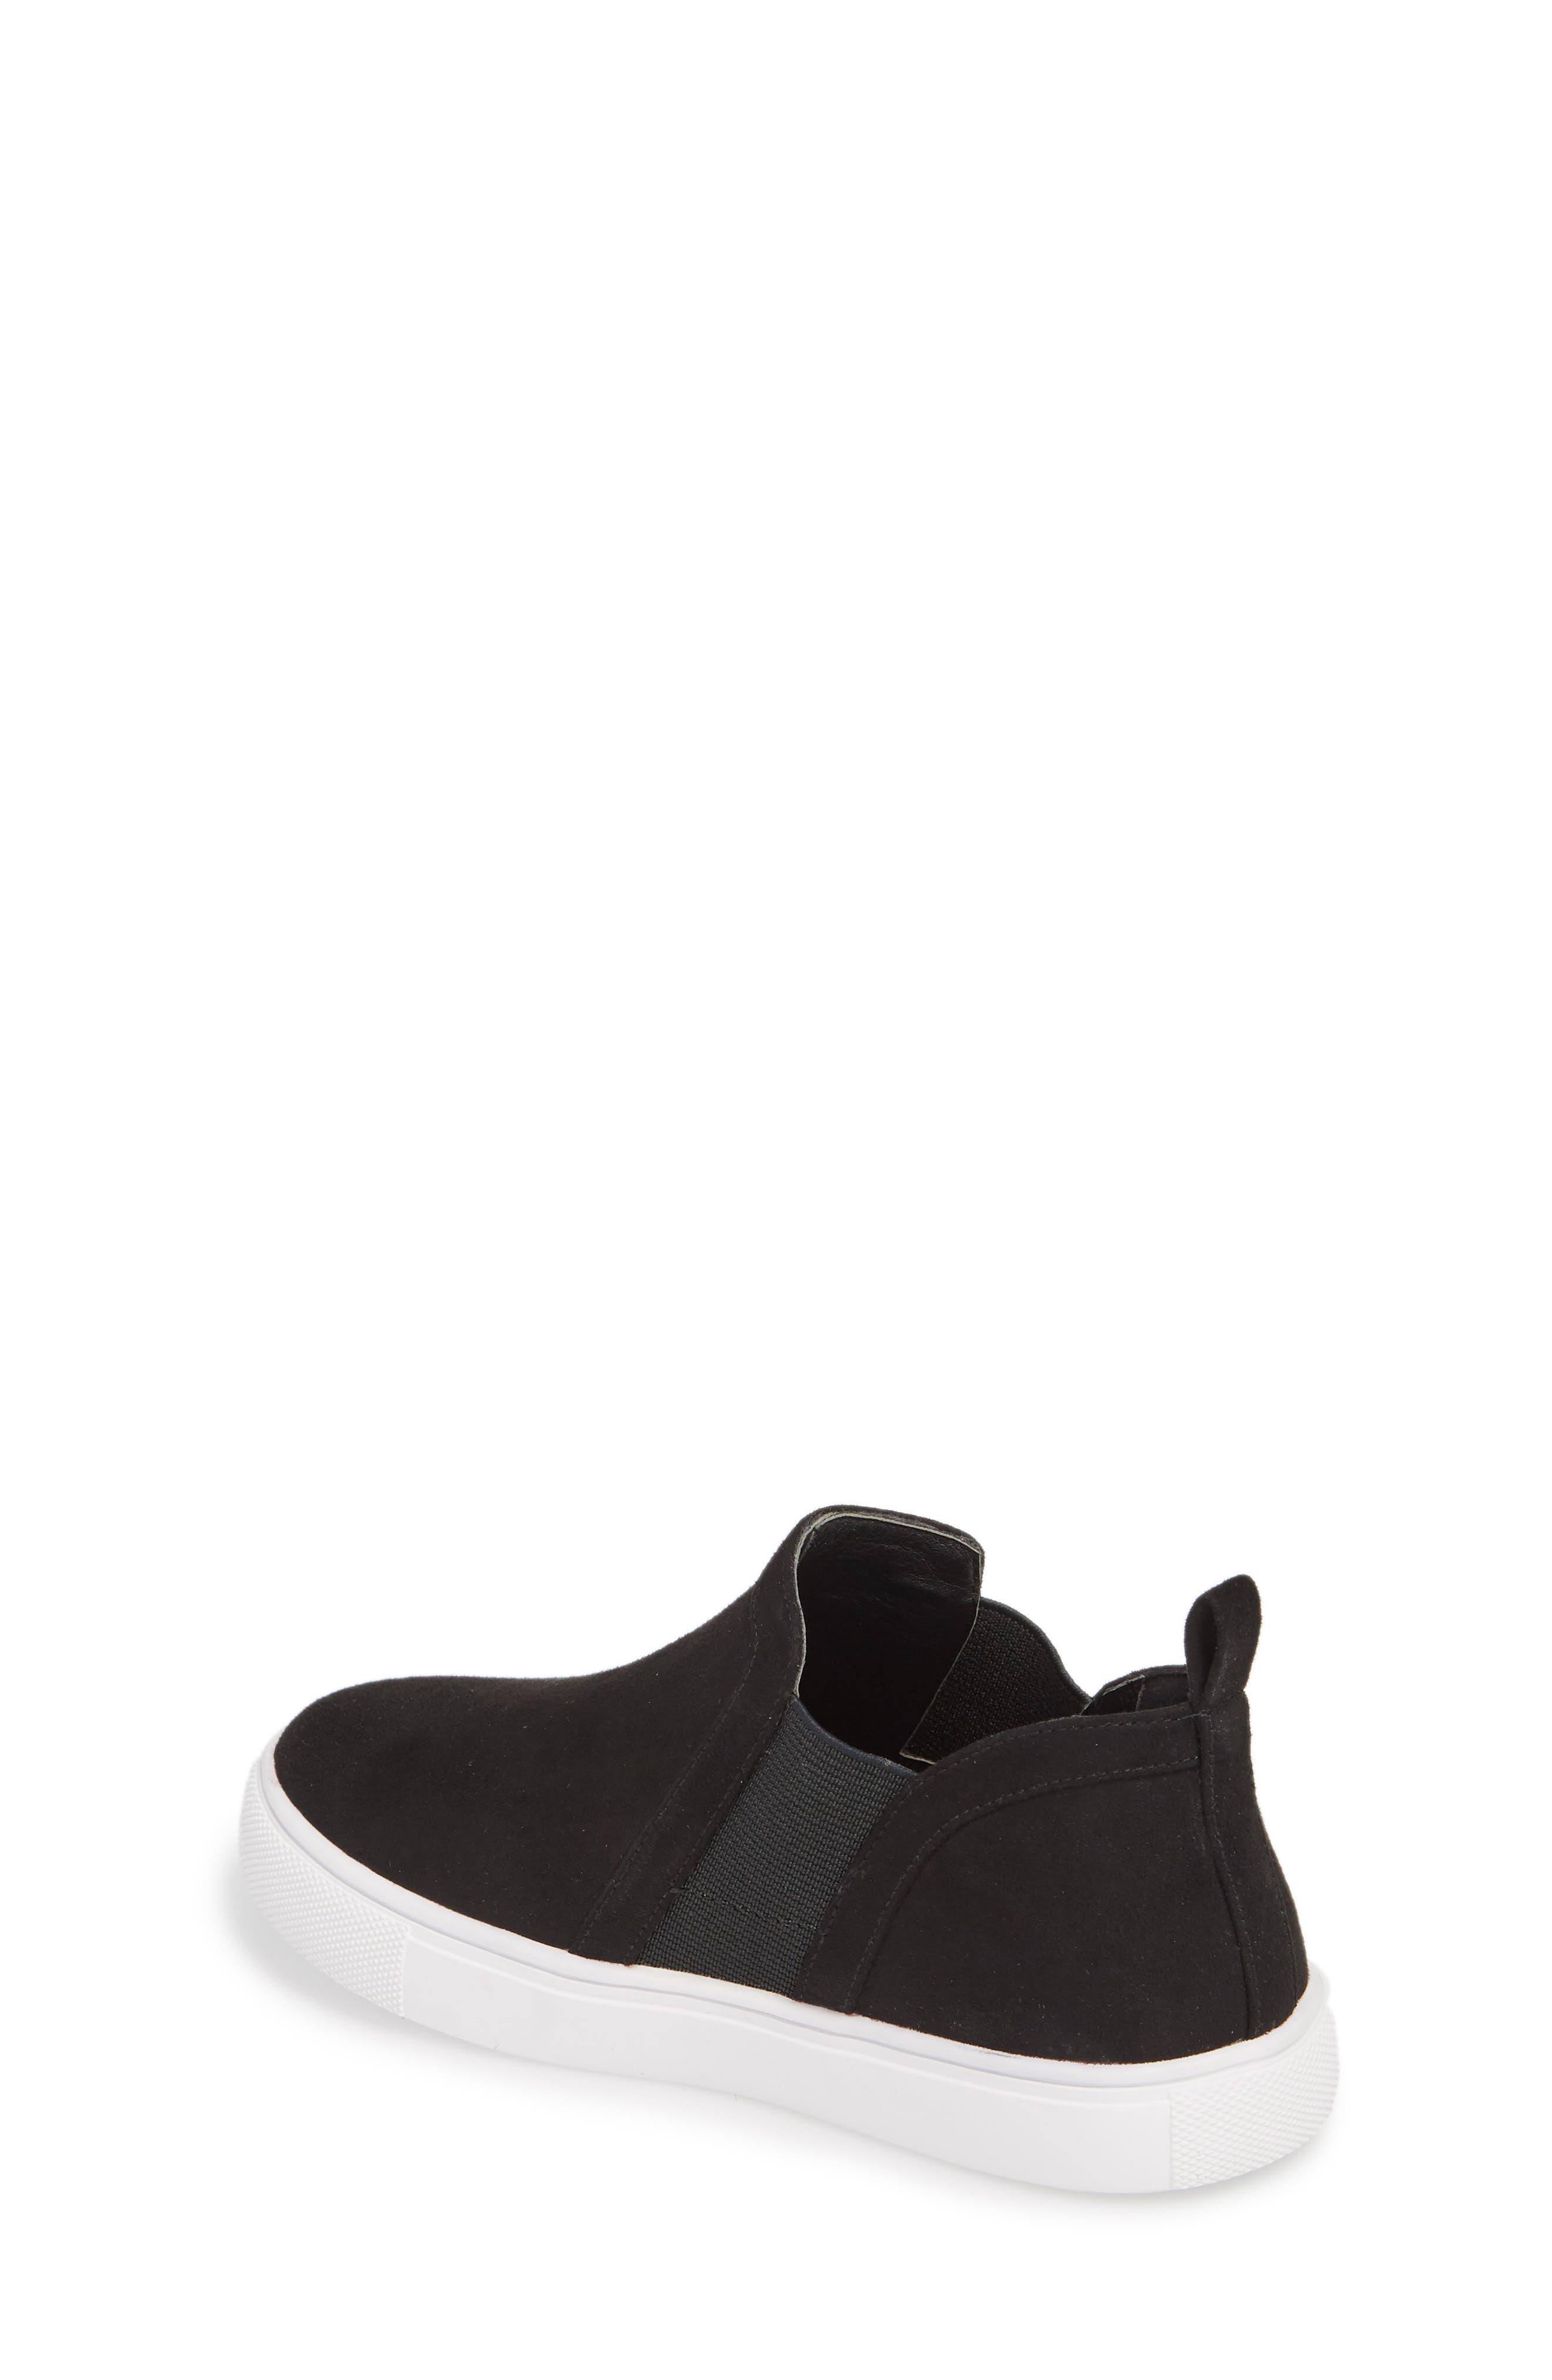 Scarlett Sneaker,                             Alternate thumbnail 2, color,                             BLACK FAUX SUEDE